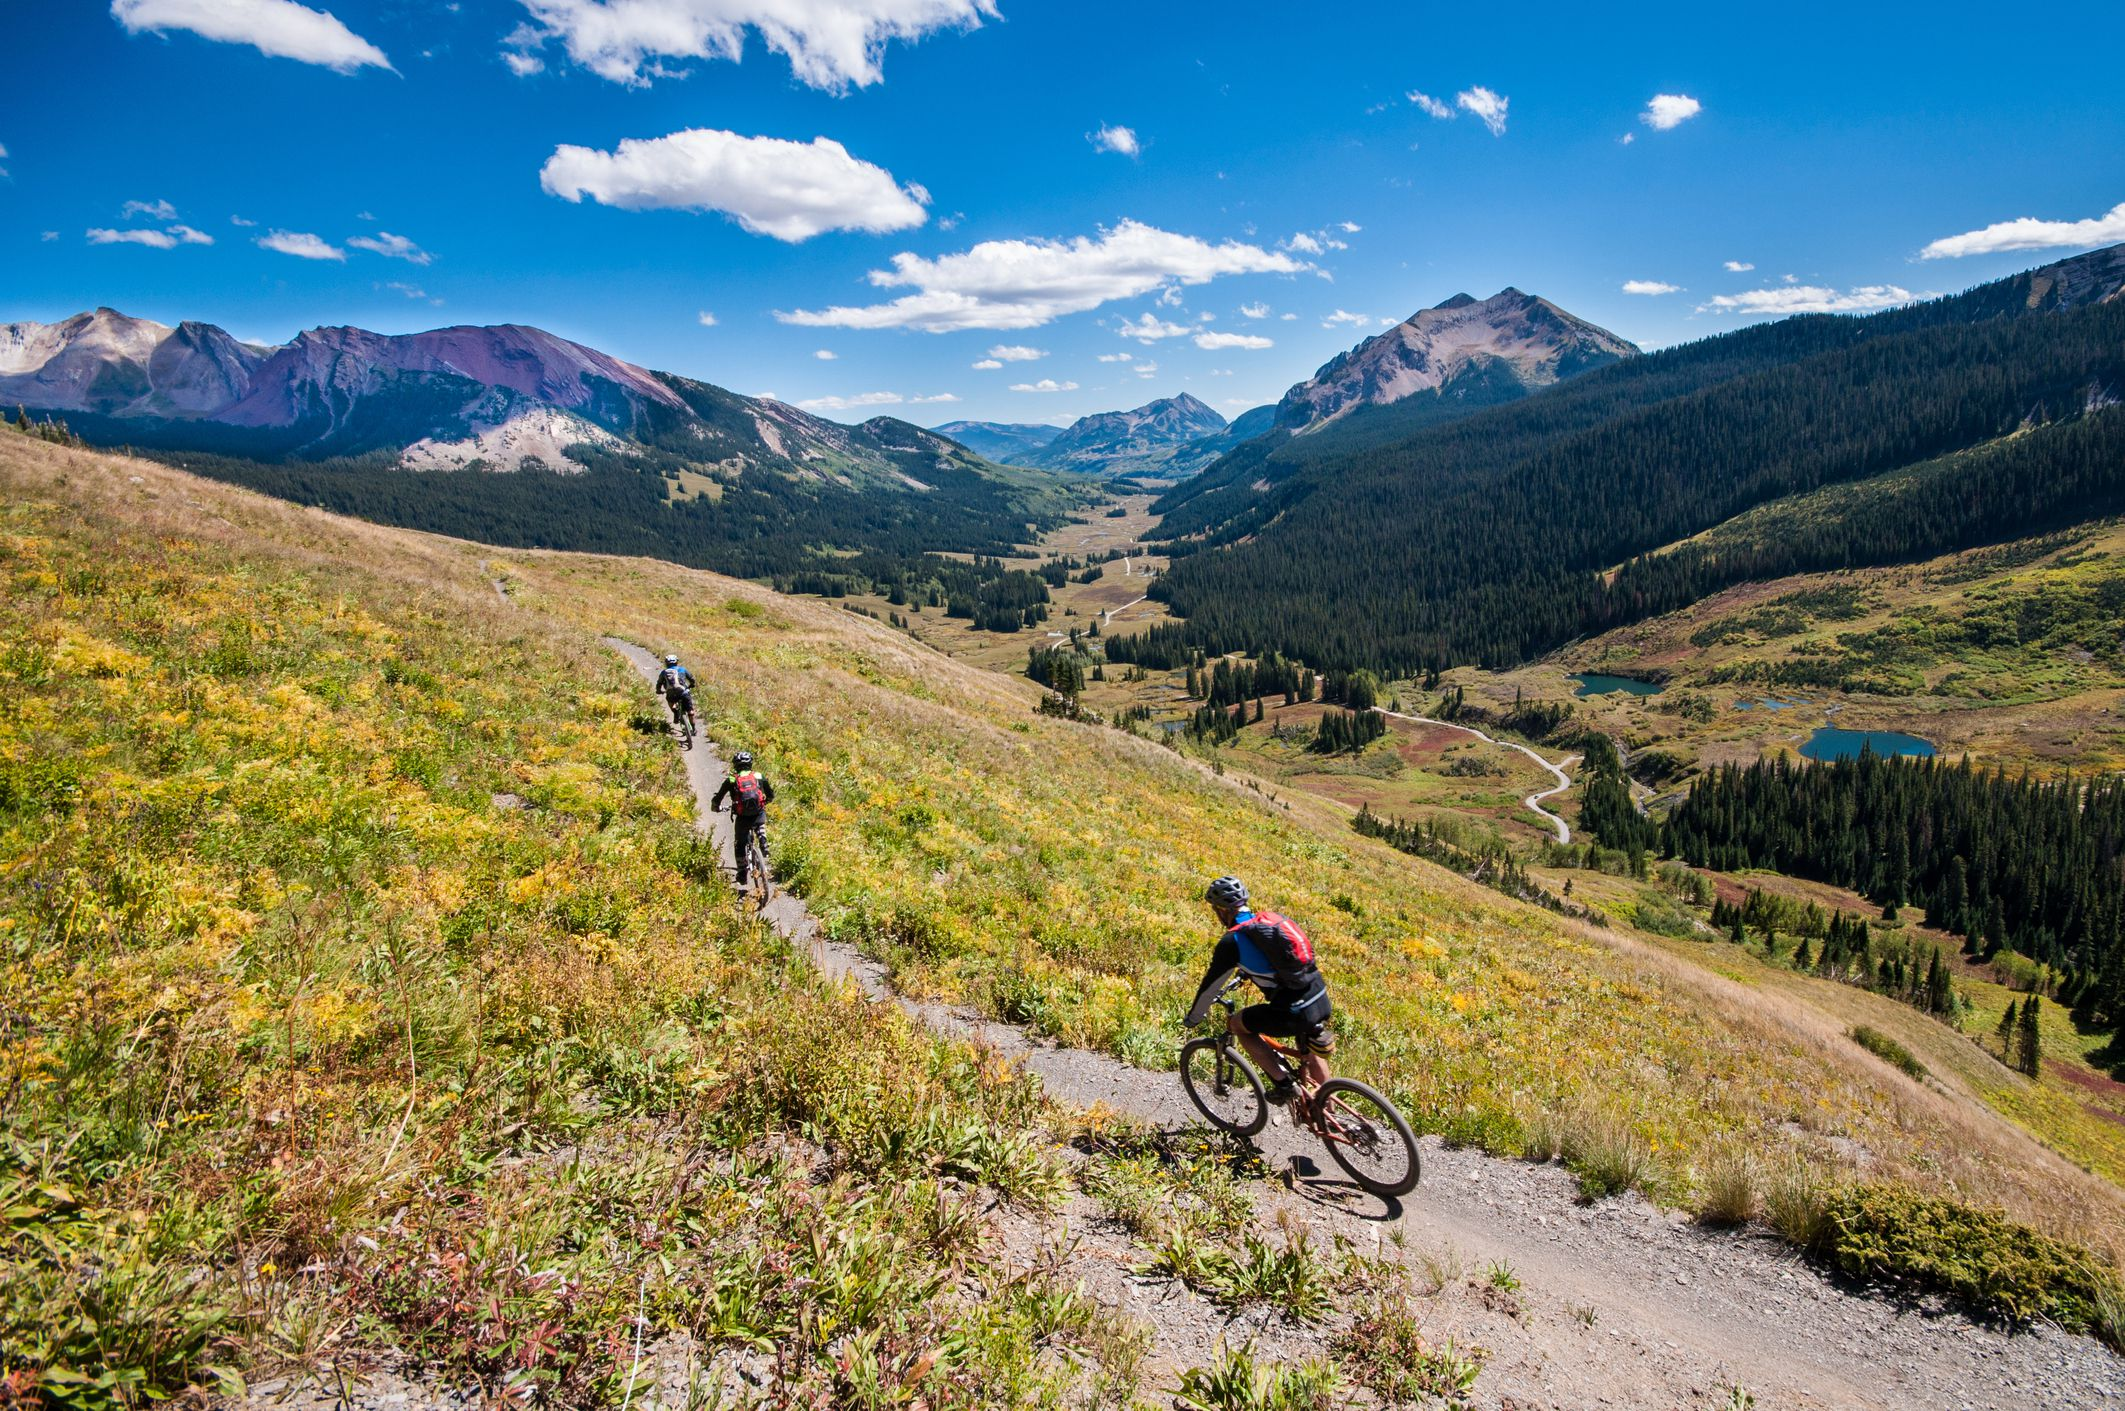 Mountain biking in Crested Butte